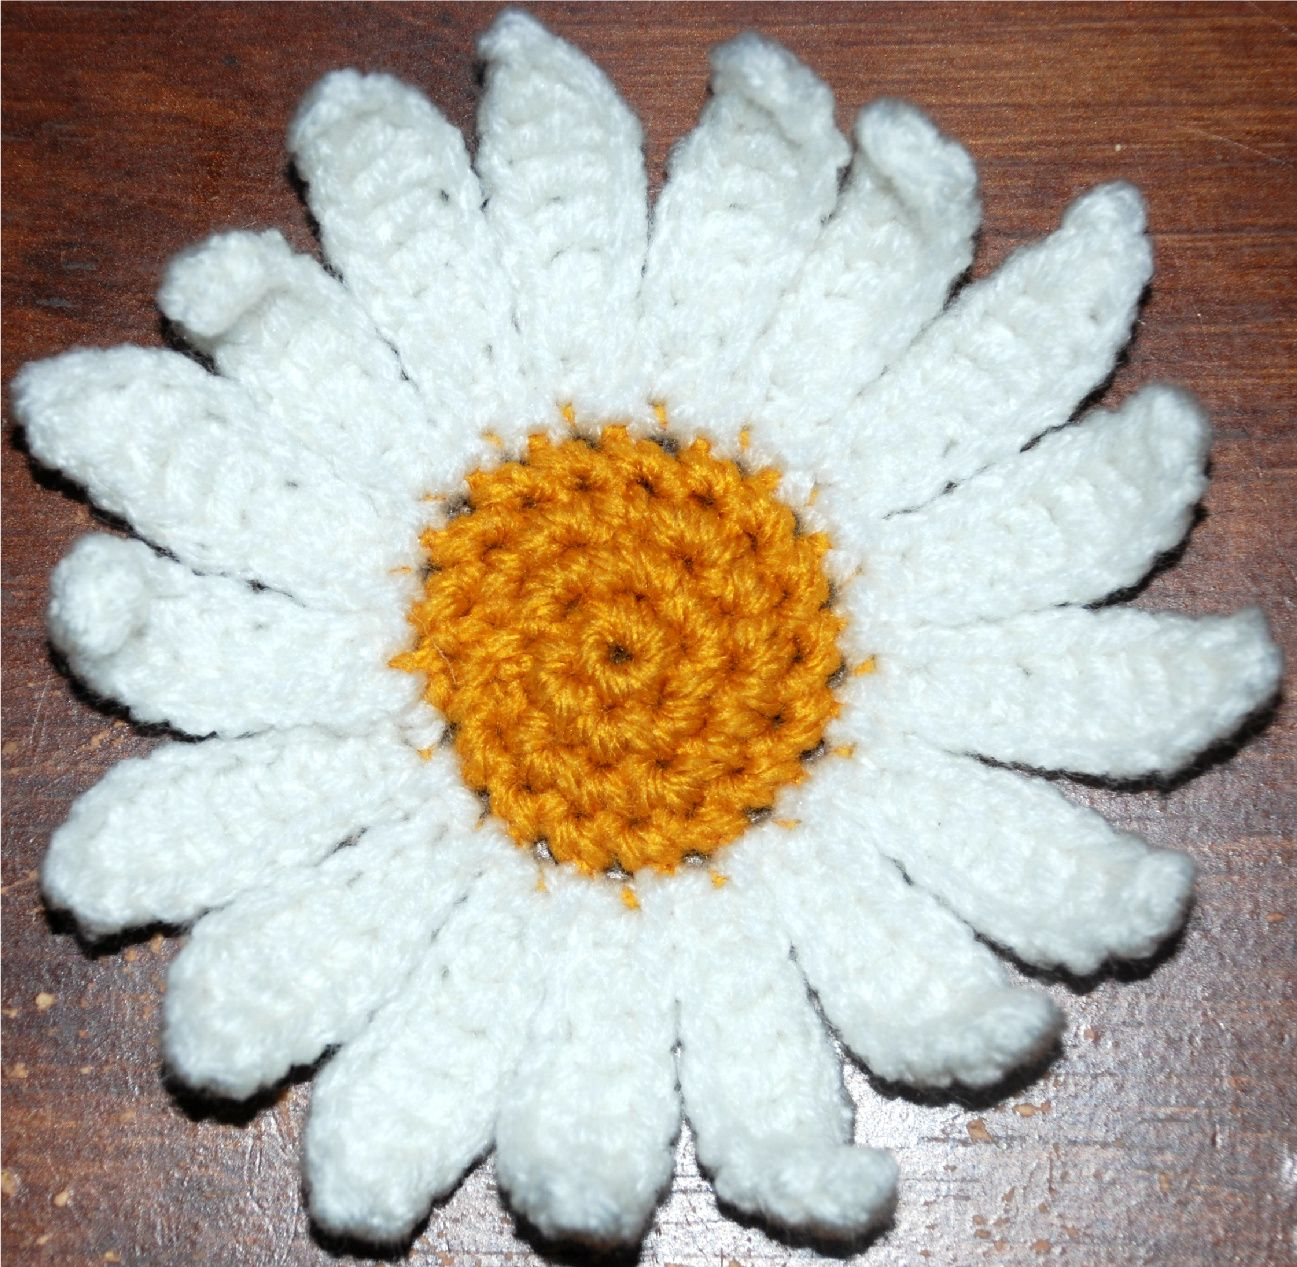 Crochet daisies crafthubs crochet misc patterns pinterest free crochet pattern for a crochet daisy flower by crochet jewel izmirmasajfo